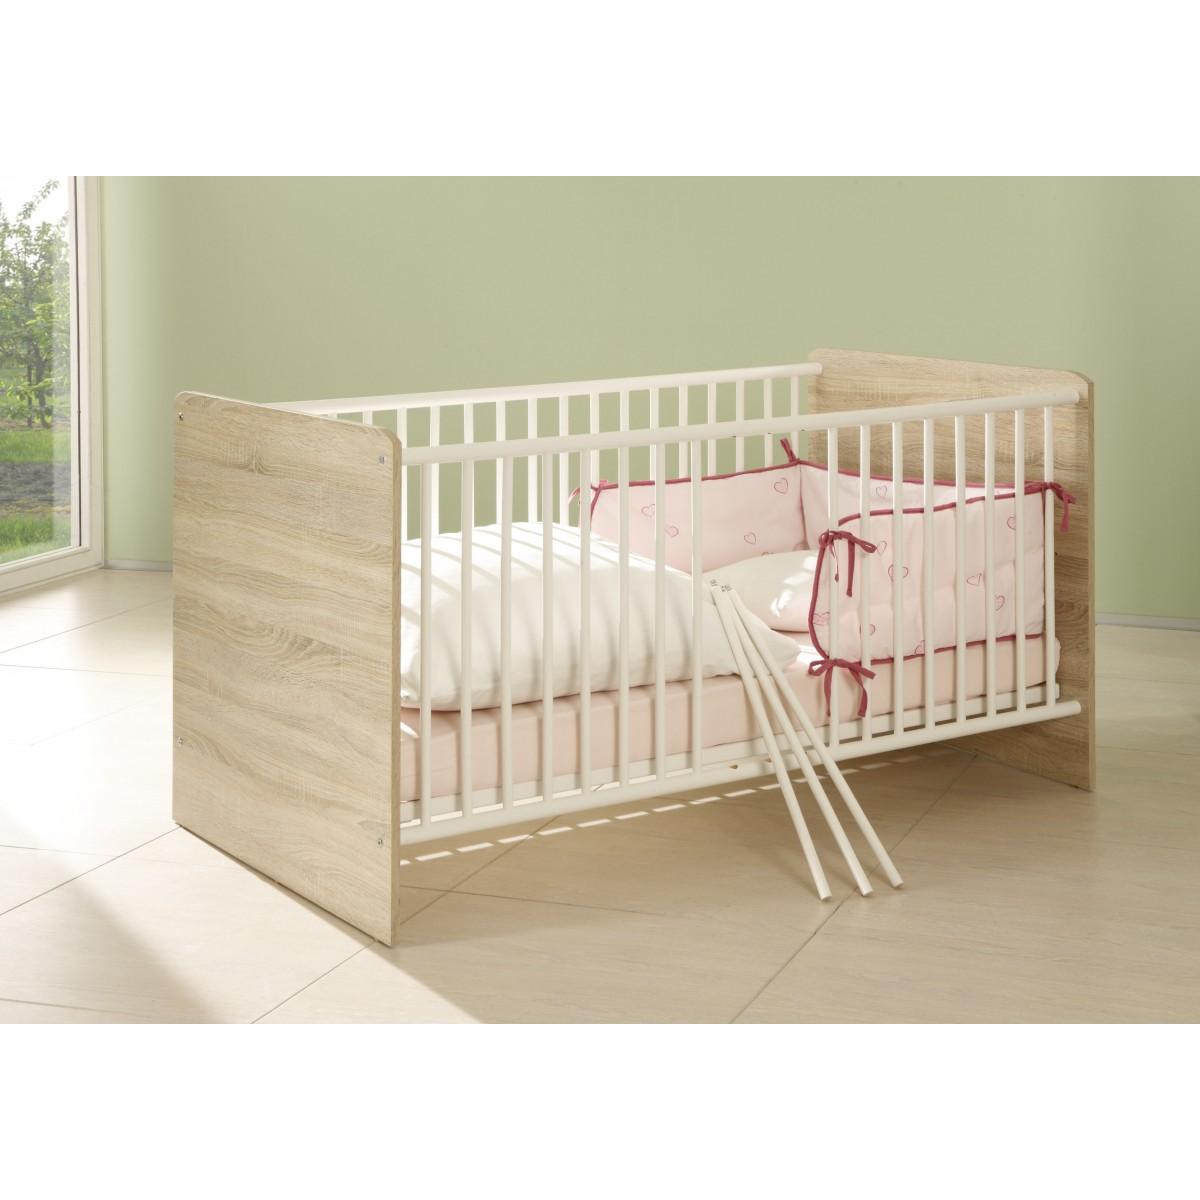 babyzimmer wiki 3 teilig eiche sonoma. Black Bedroom Furniture Sets. Home Design Ideas